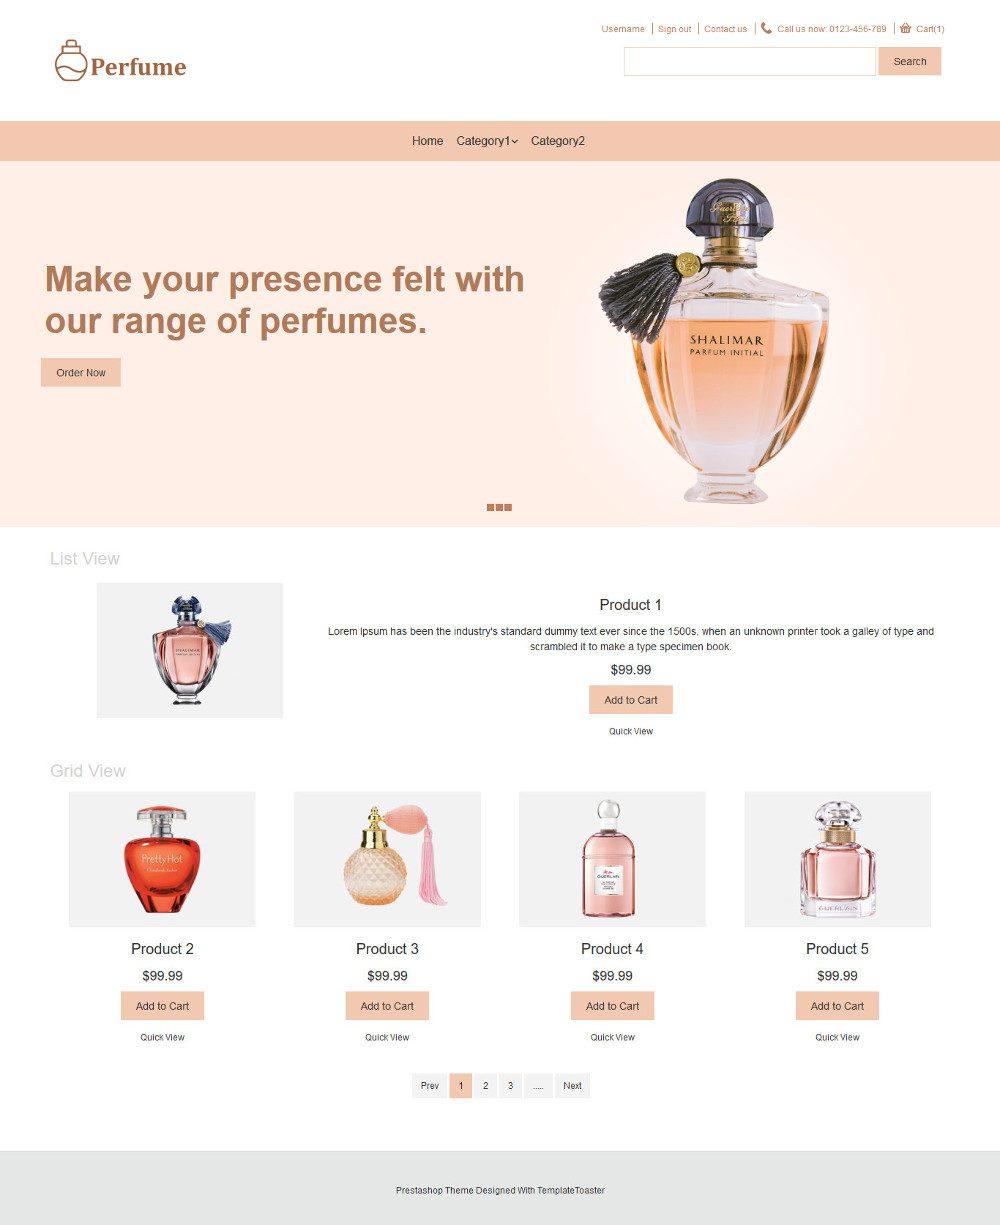 Perfume Online Store Virtuemart Template